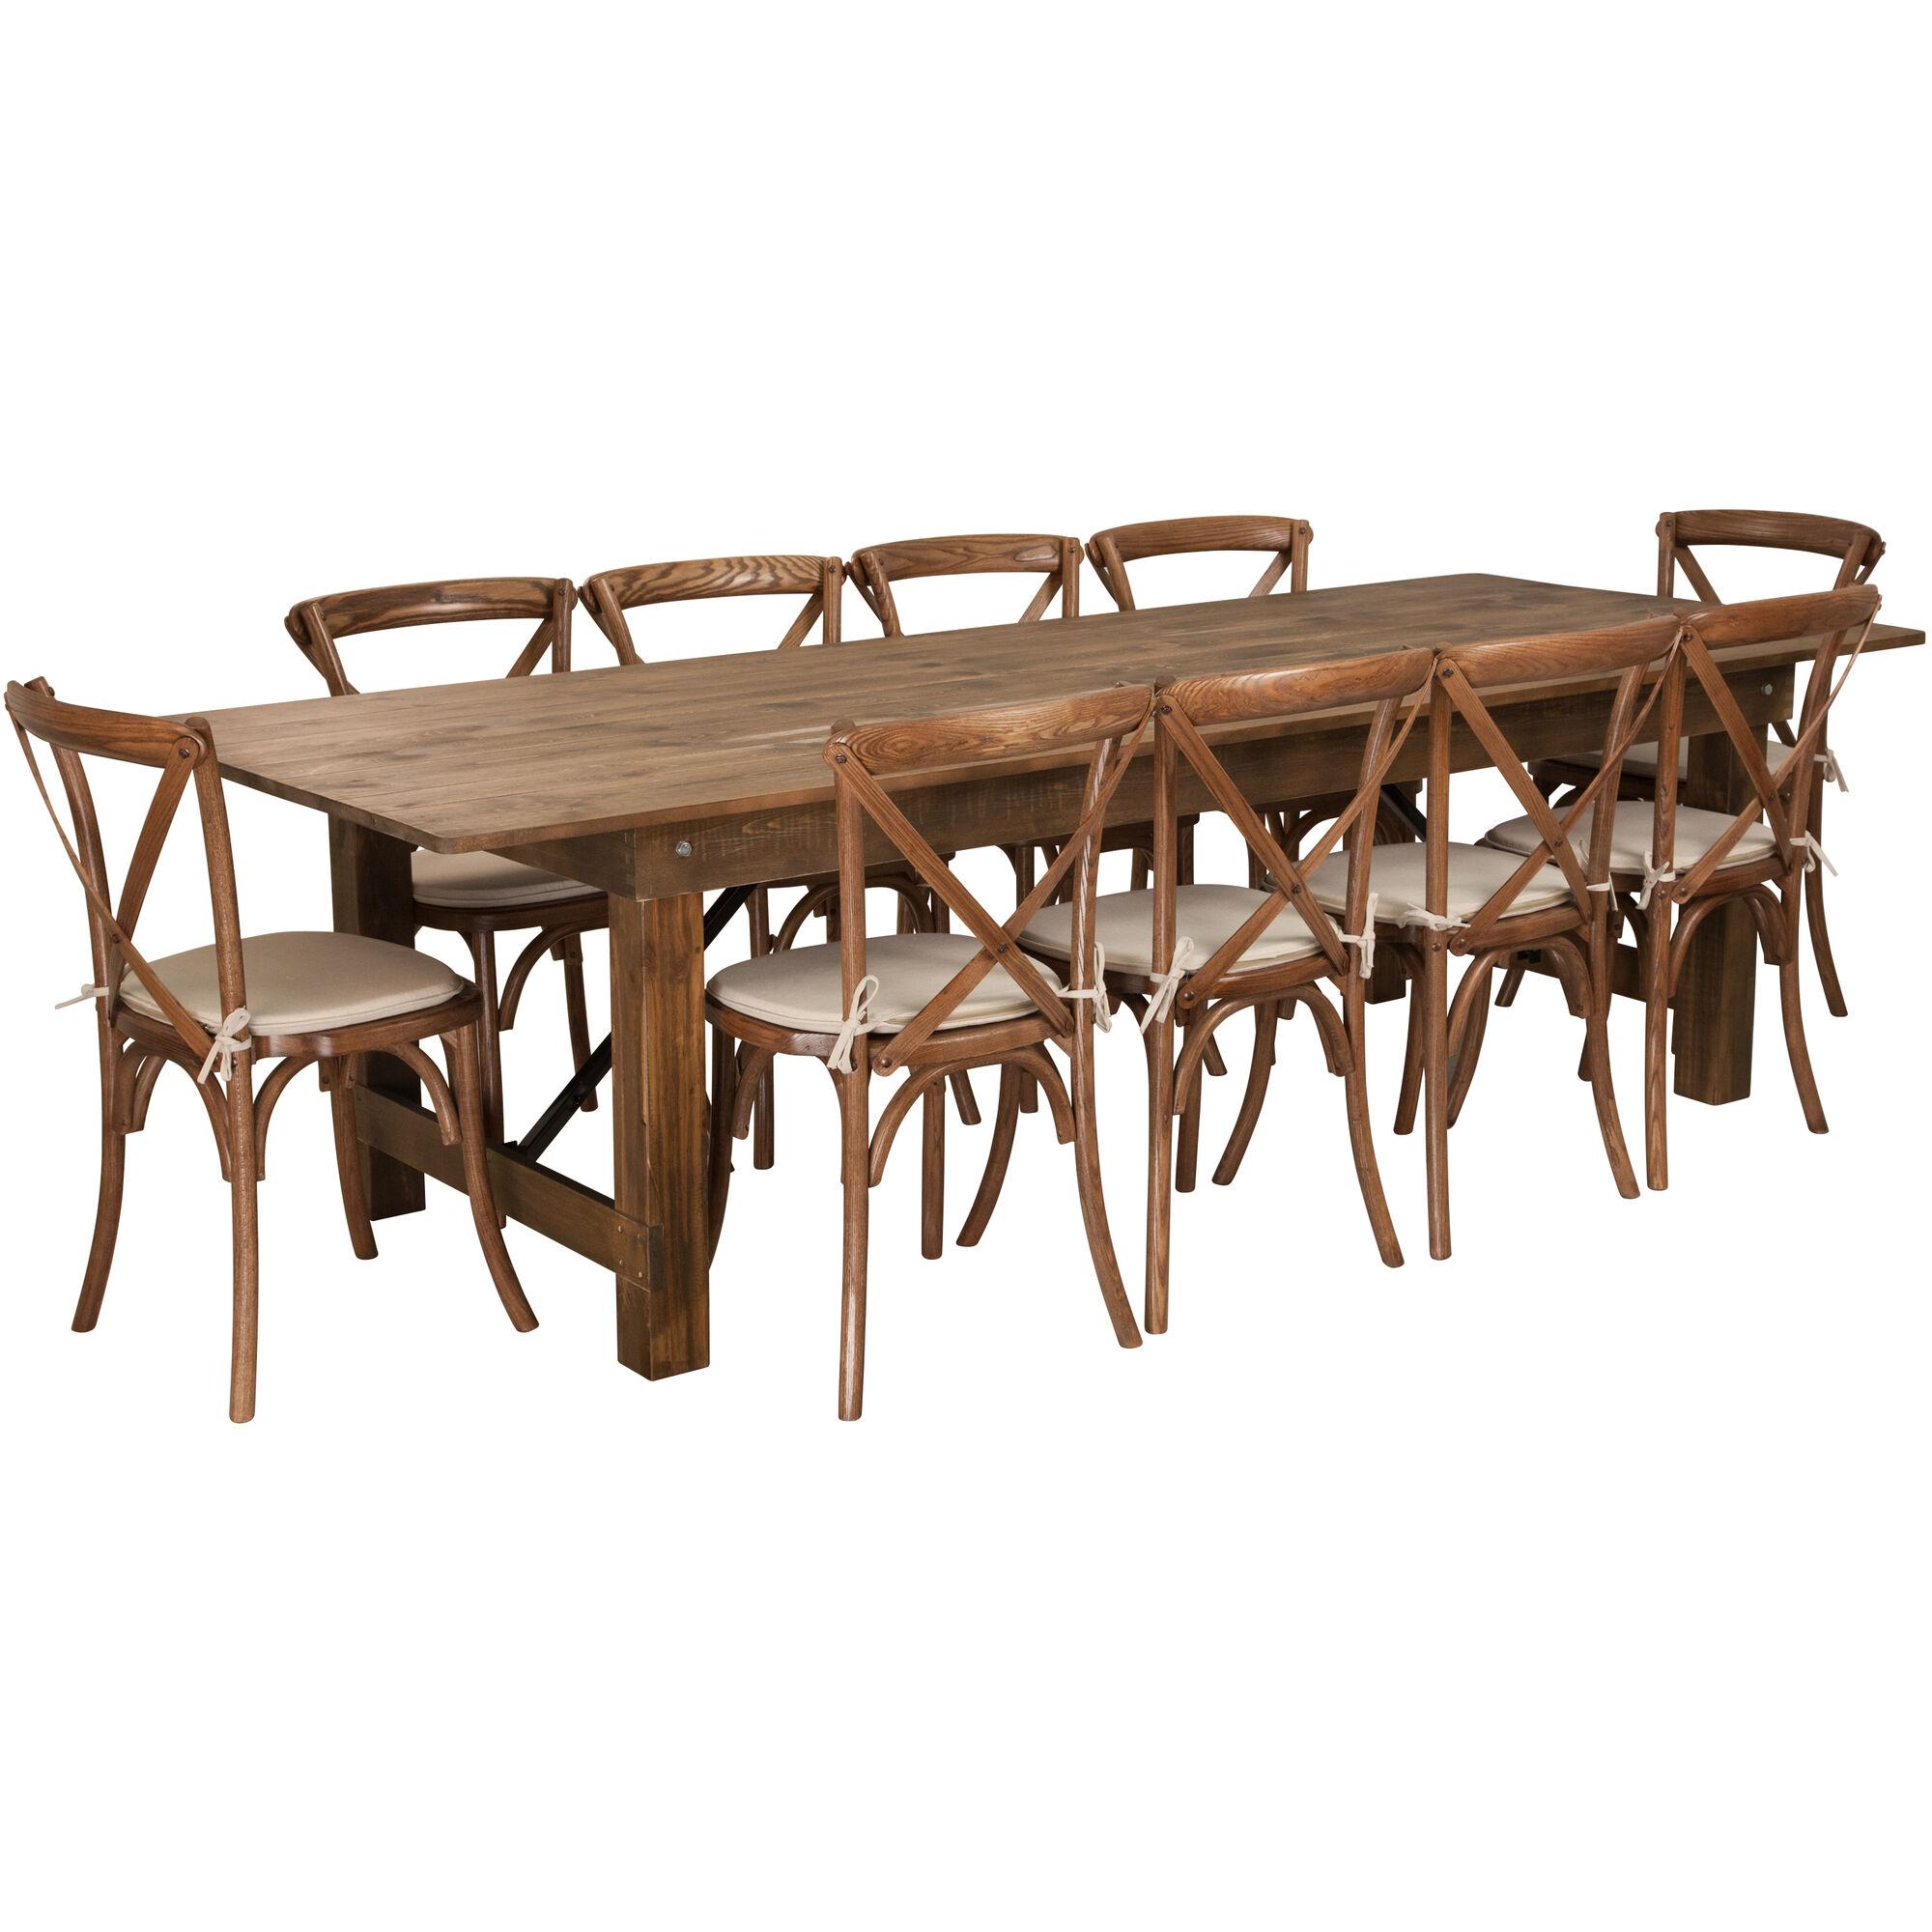 Awesome Hercules Series 9 X 40 Antique Rustic Folding Farm Table Set With 10 Cross Back Chairs And Cushions Frankydiablos Diy Chair Ideas Frankydiabloscom